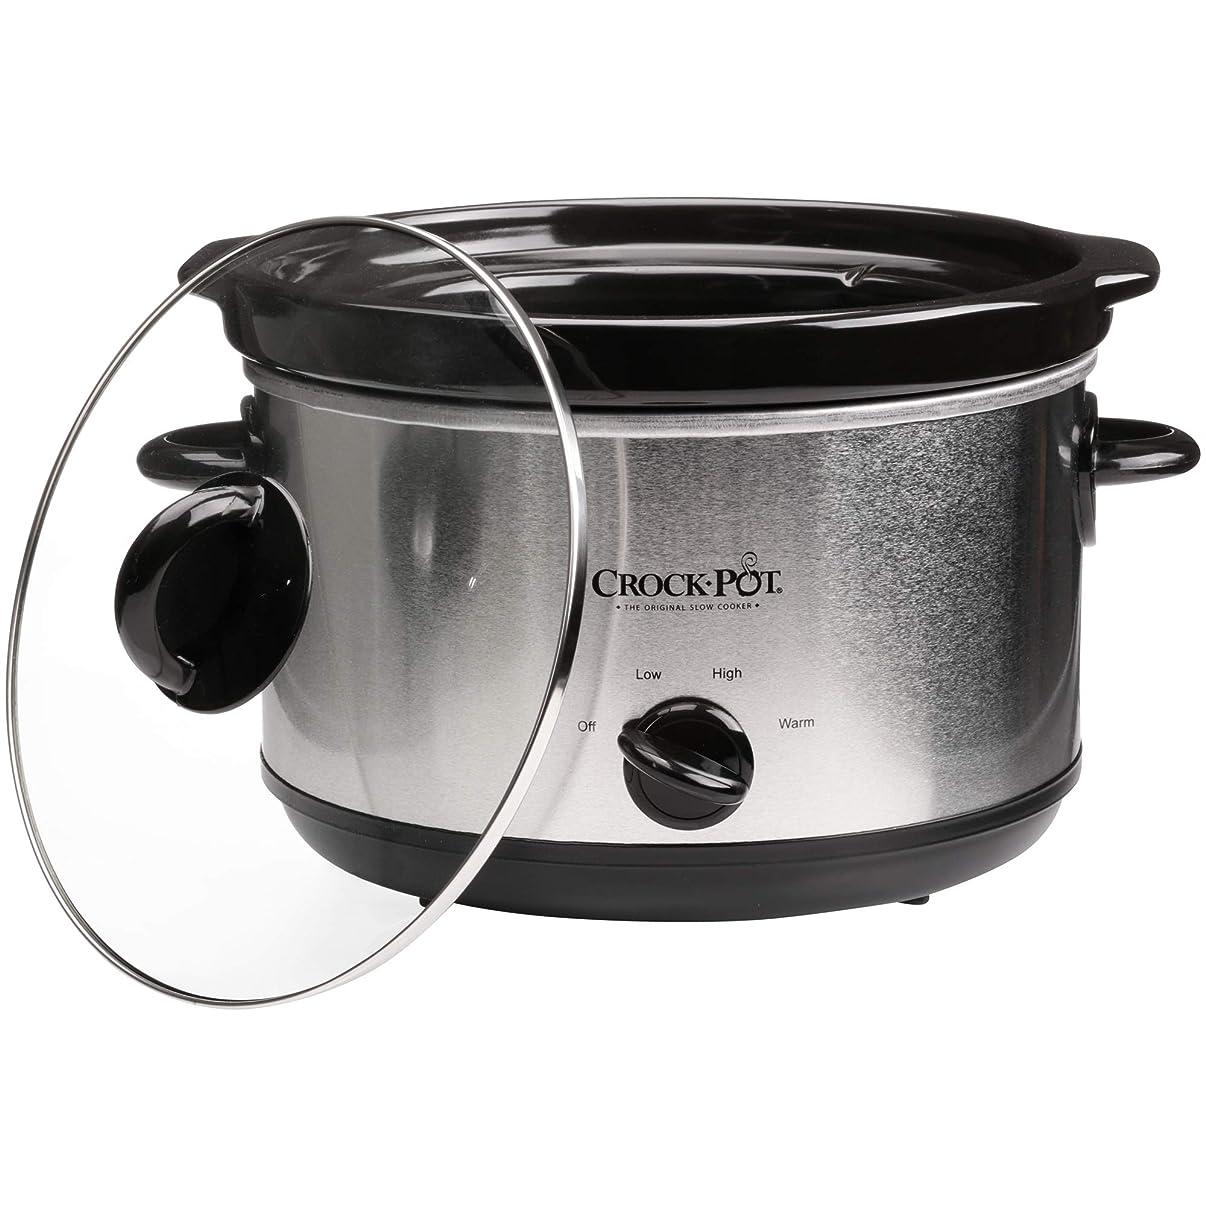 Original Slow Crock-Pot Cooker Stainless 5-Qt